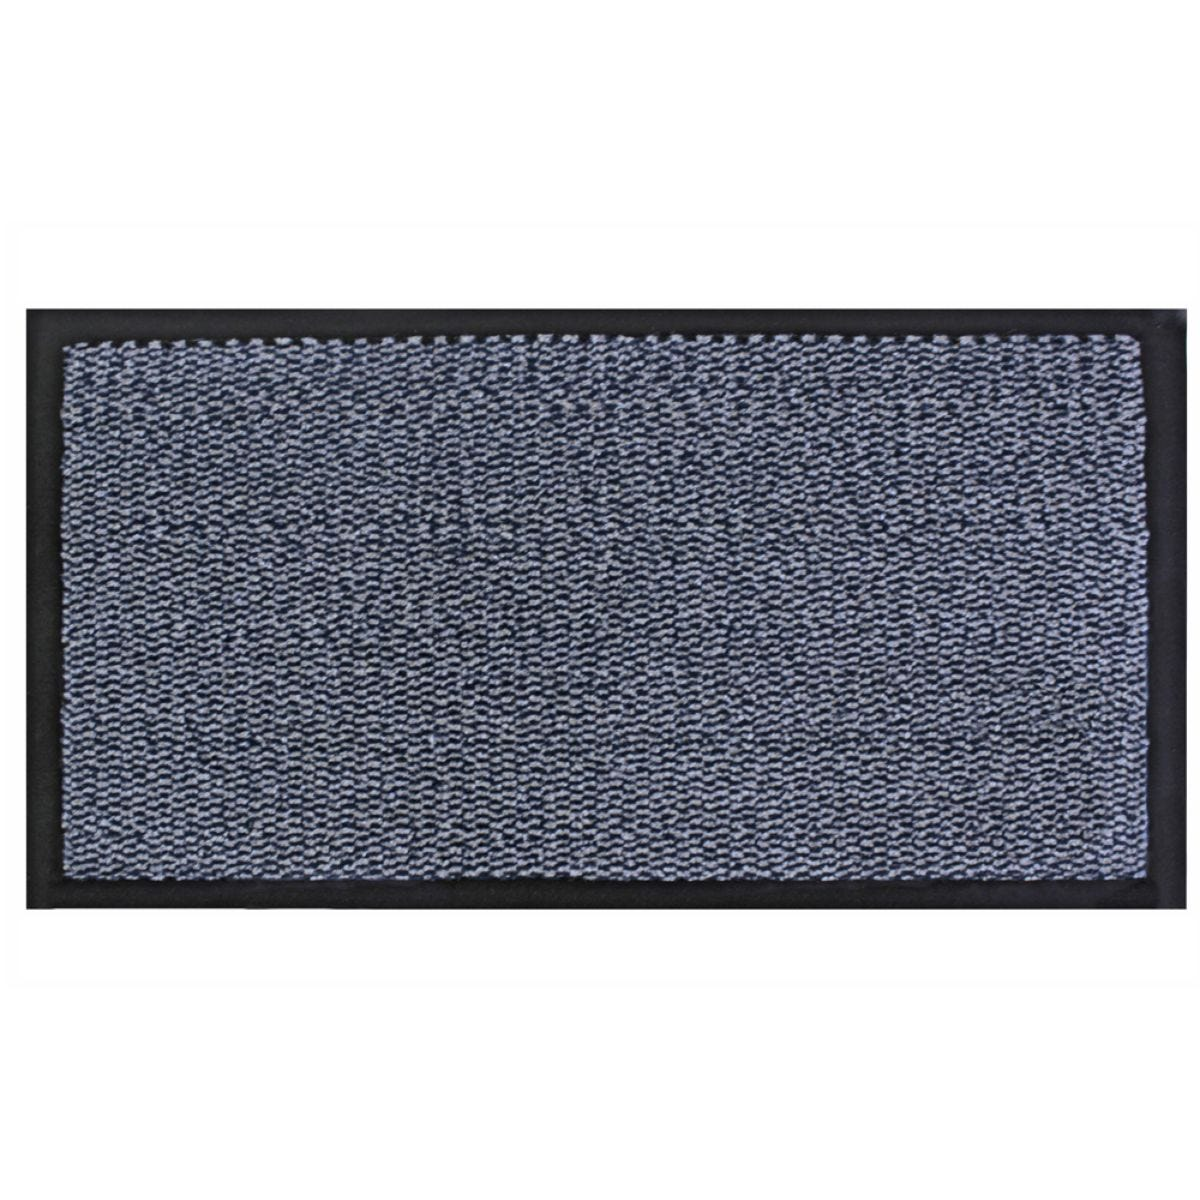 JVL Heavy Duty Commodore Backed Barrier Door Floor Mat Blue/Black 80 x 140 cm